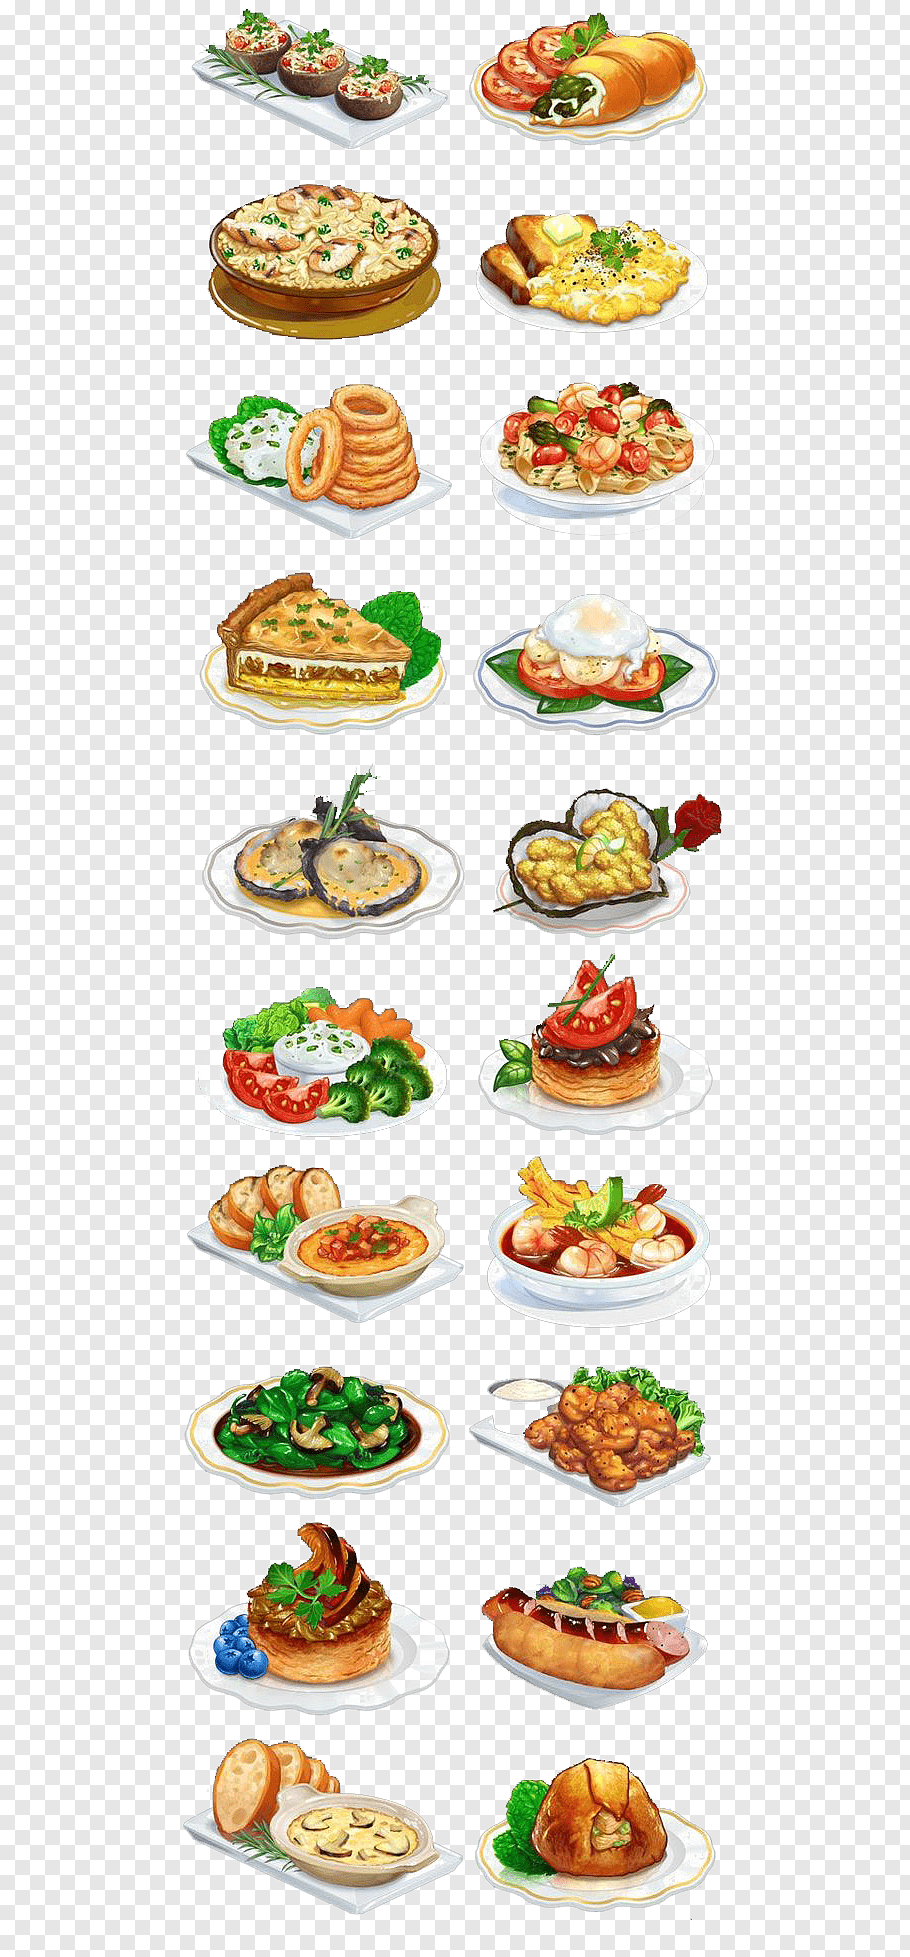 Assorted food illustration, Doughnut Food Dish, food free.